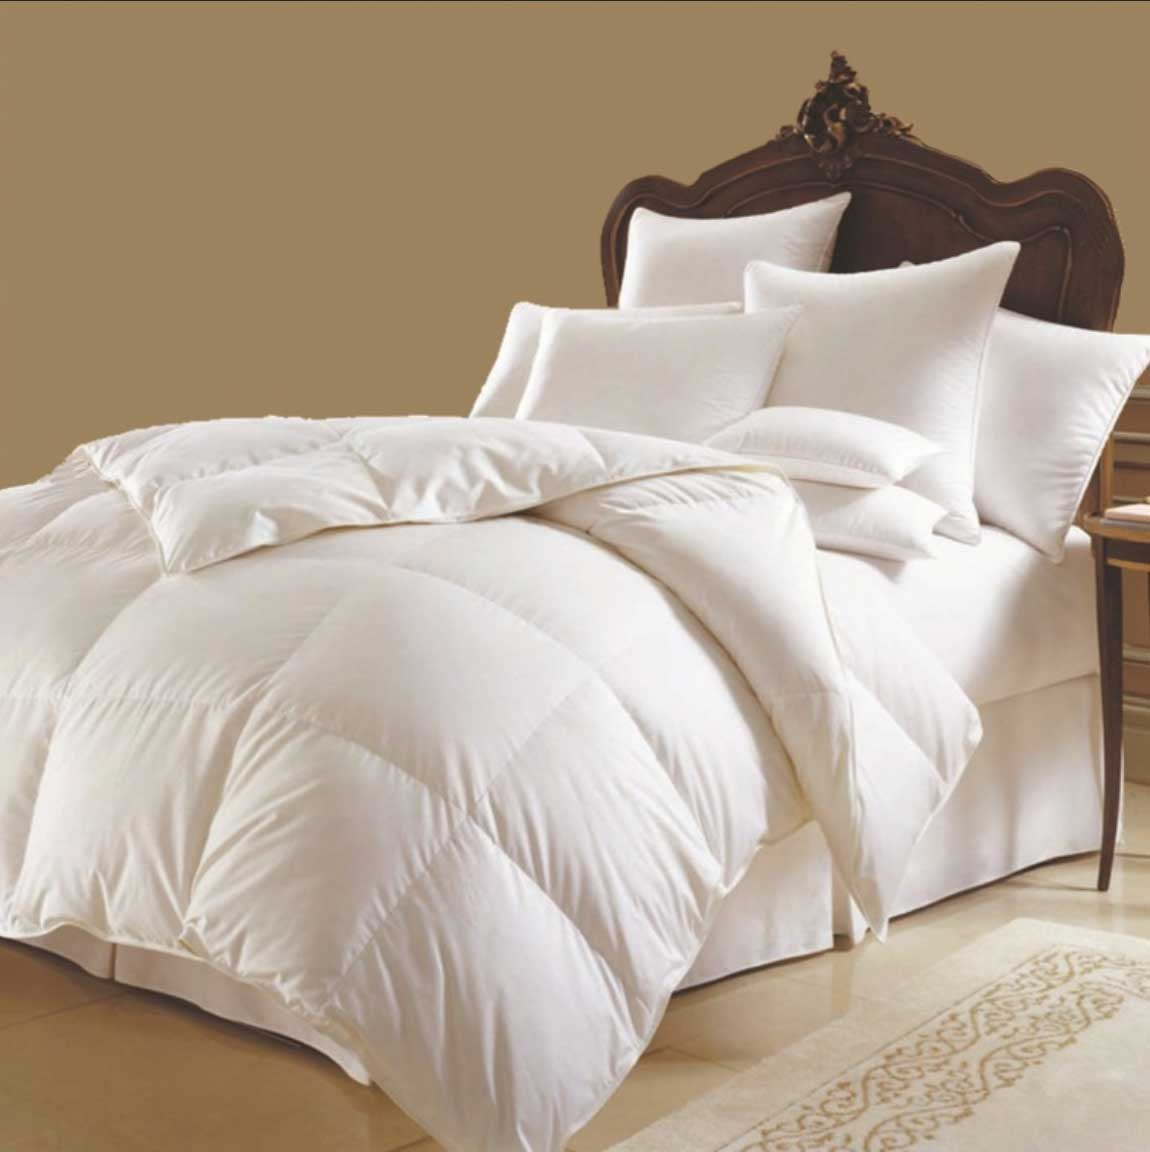 luxe couette blanche oreiller cotton silicone set 4 saisons 220x240 cm ebay. Black Bedroom Furniture Sets. Home Design Ideas